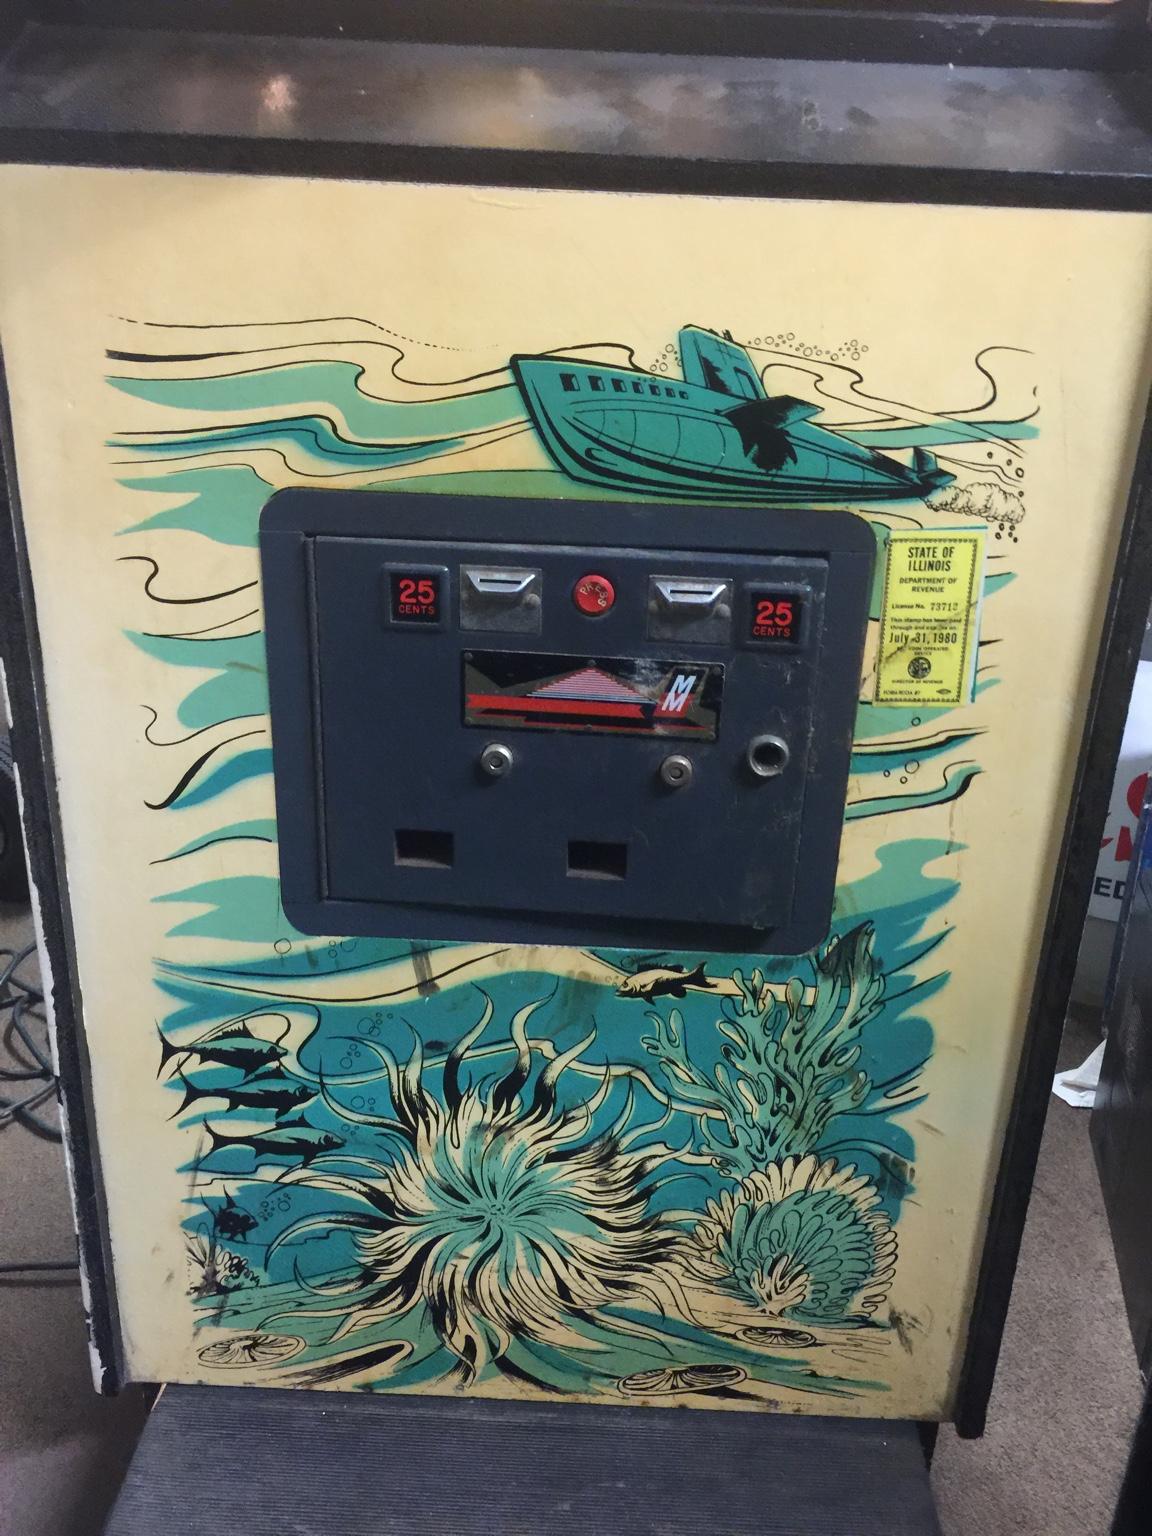 Midway slot machines